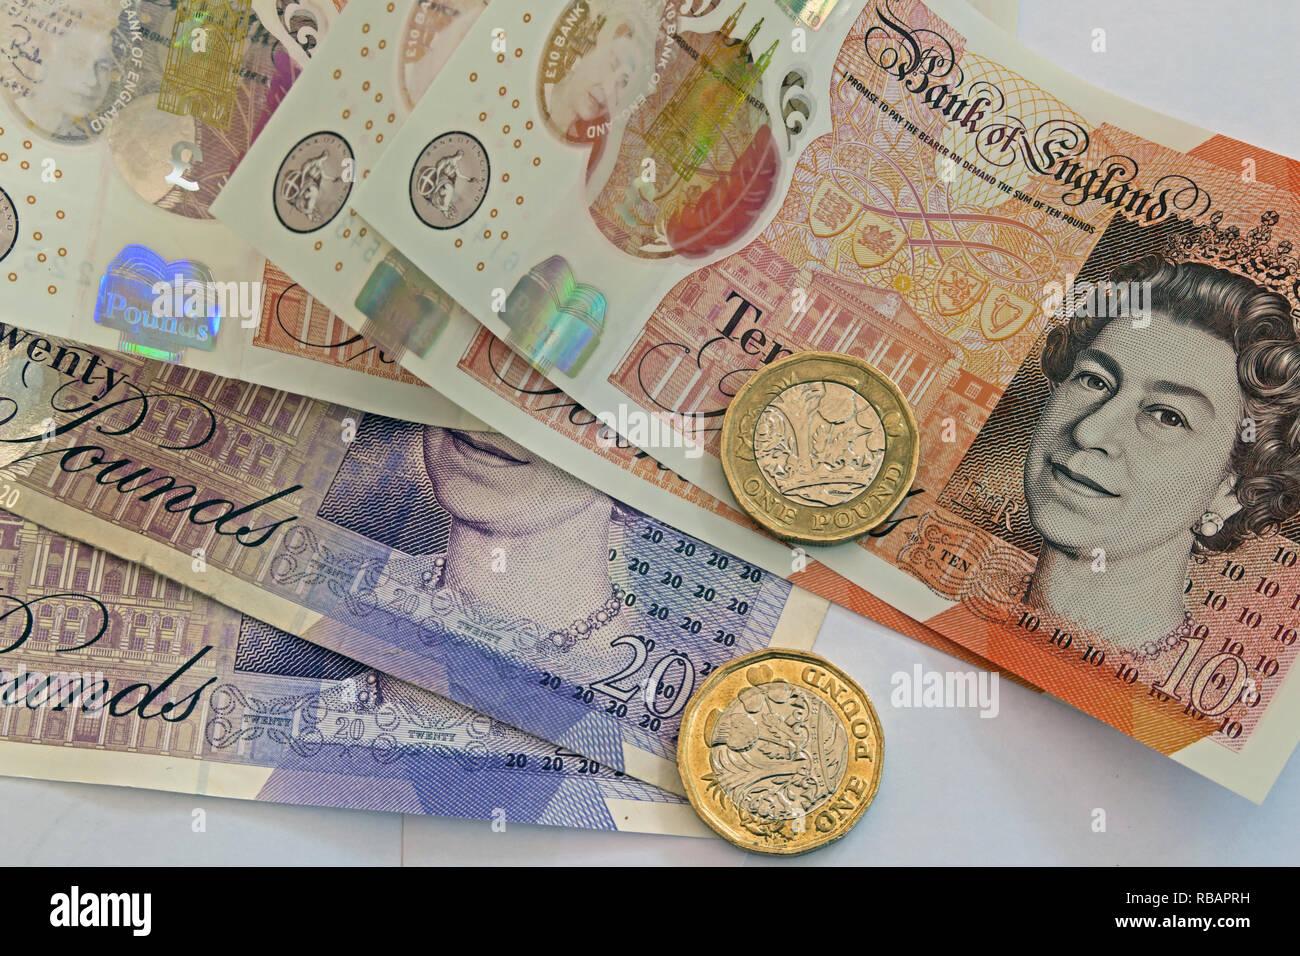 gotonysmith,HotpixUK,@HotpixUK,UK,notes,plastic,currency,10,5,ten,five,pound